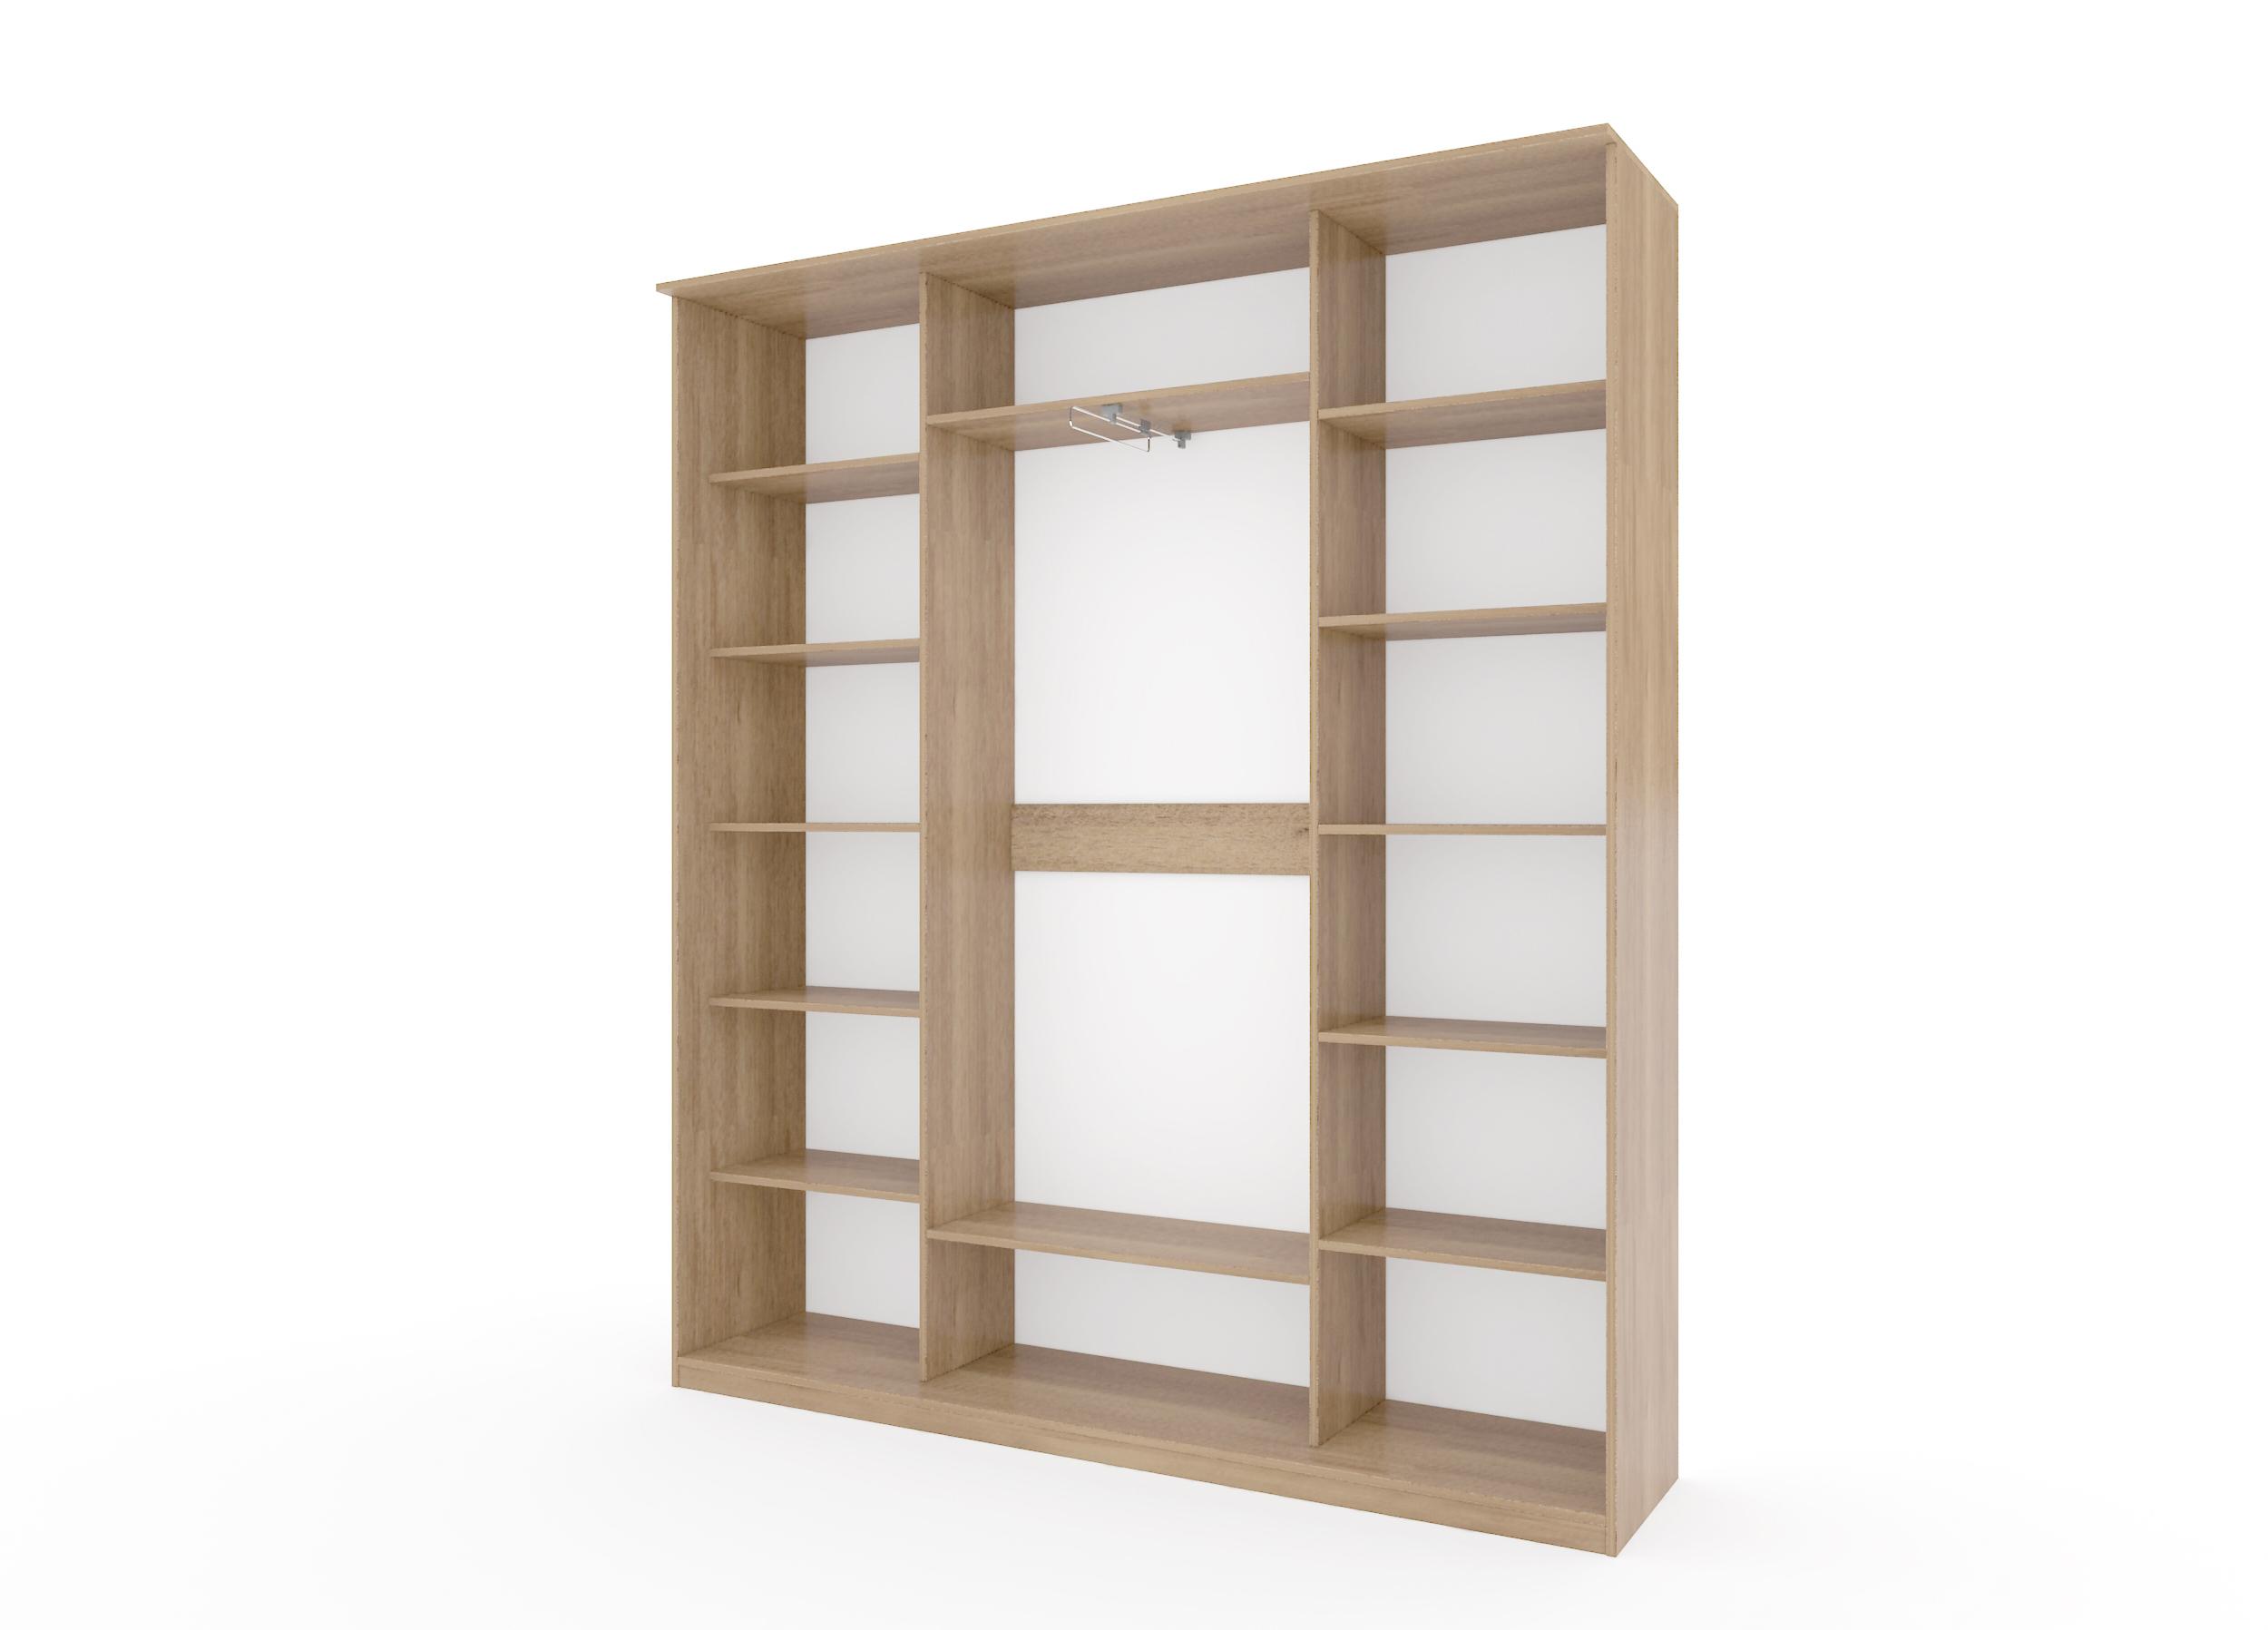 Шкаф купе Топ-Лайн 2362 / 450 / 3 секции / 2 зеркала